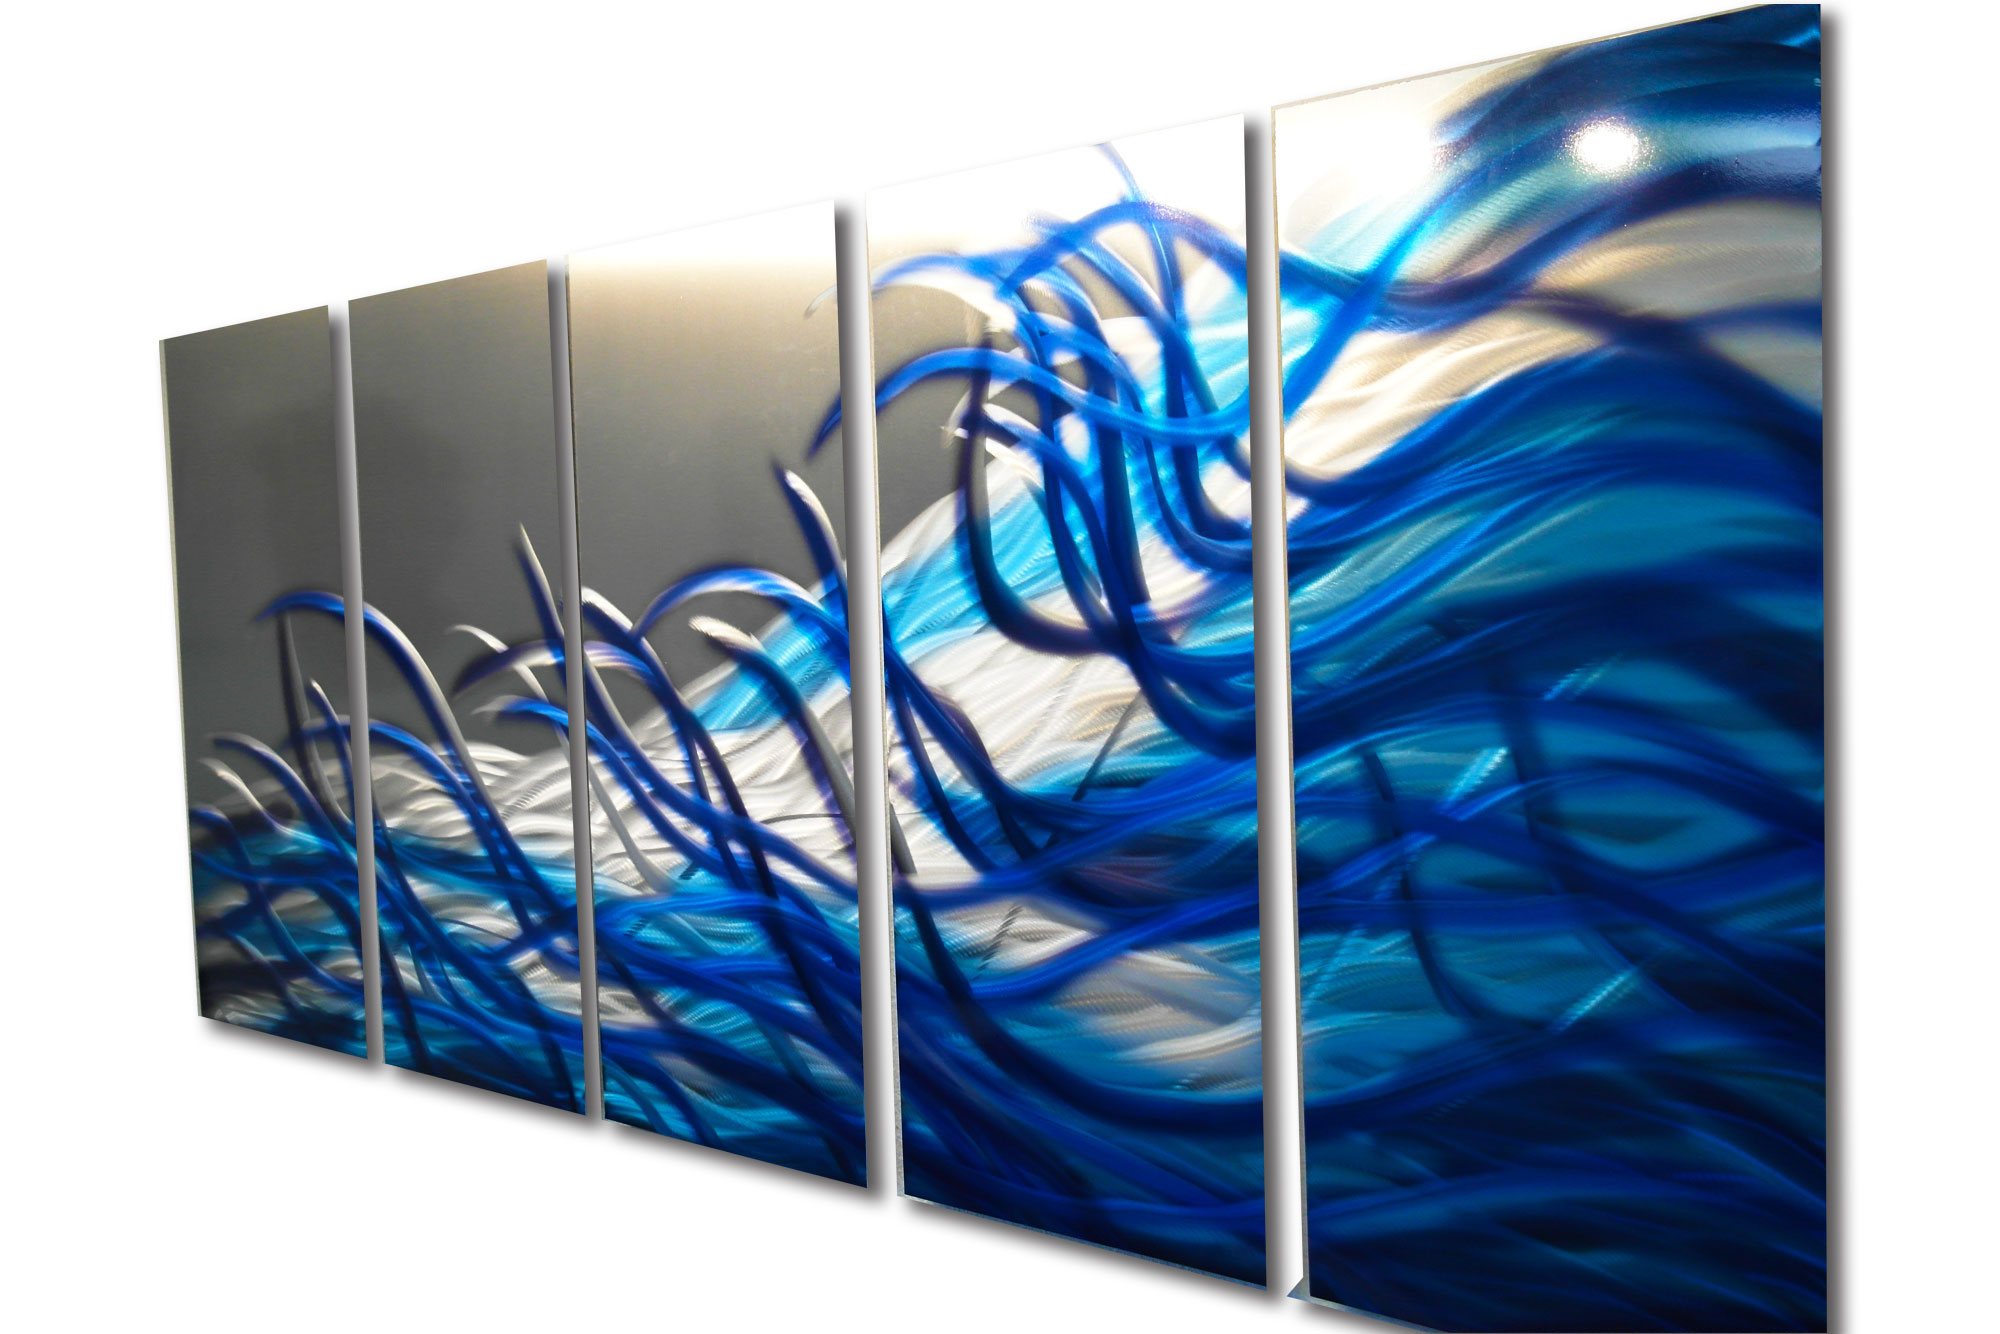 Resonance blue 36x79 metal wall art contemporary modern decor